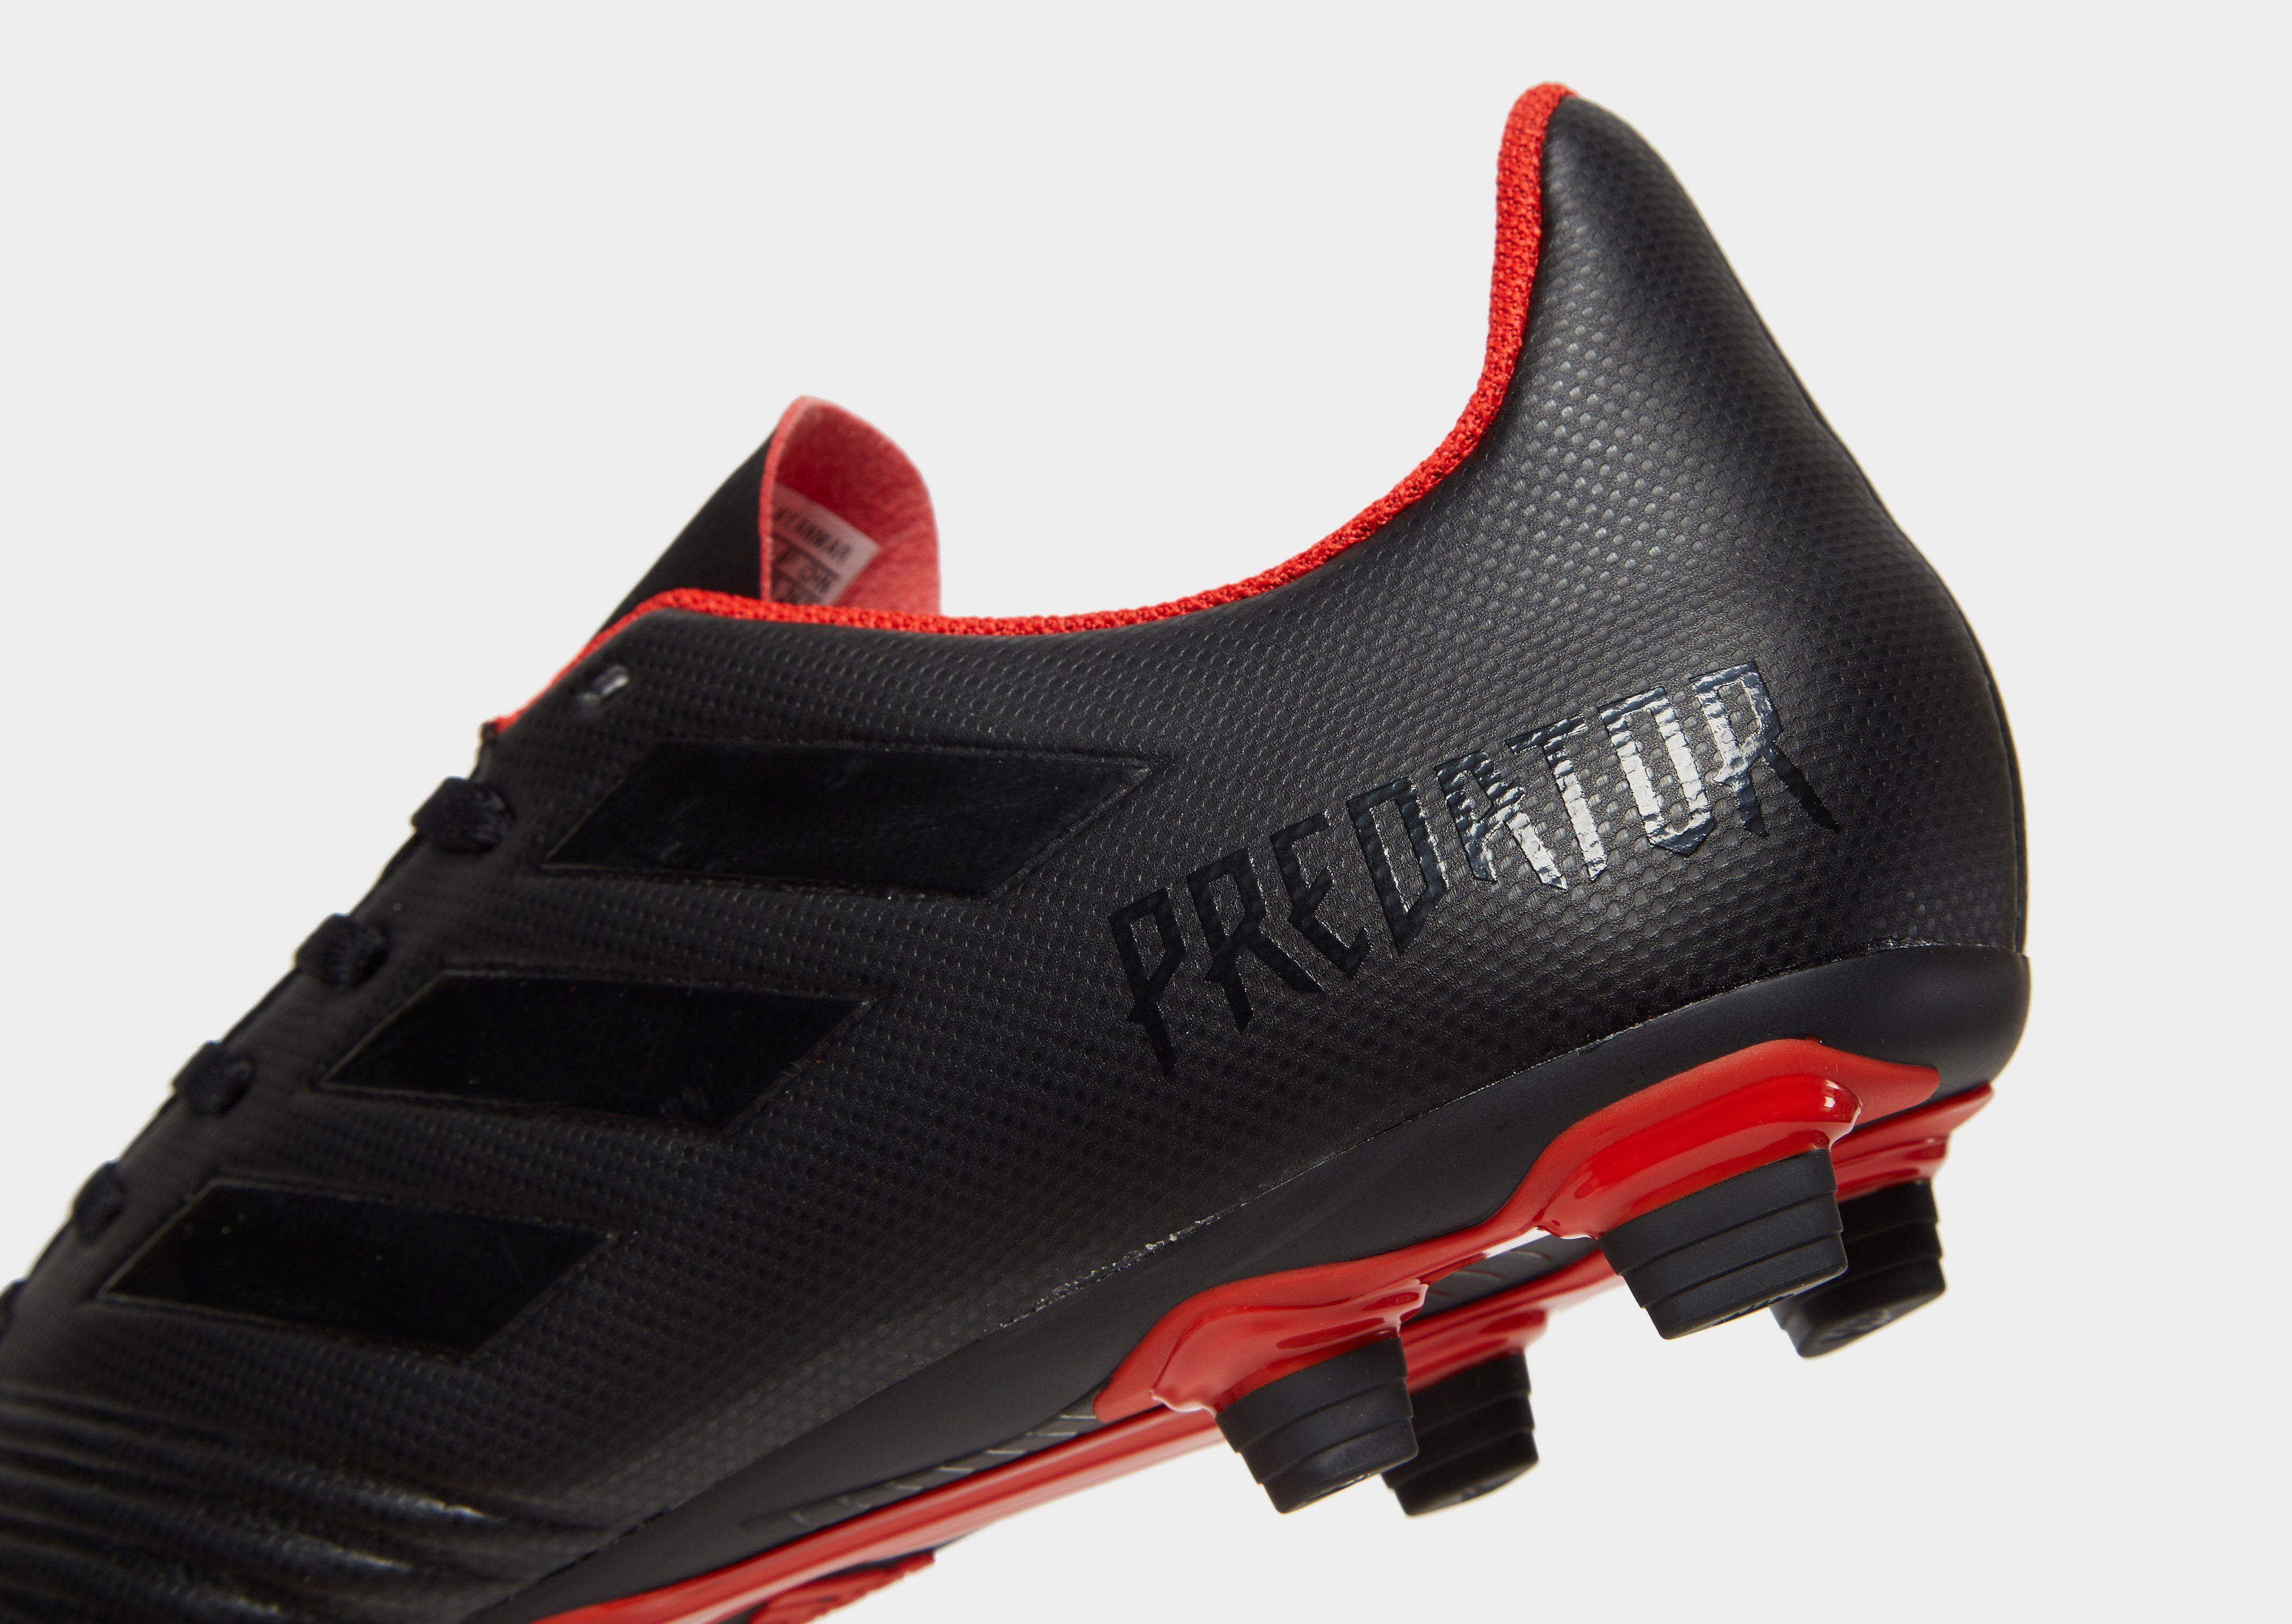 adidas Archetic Predator 19.4 FG